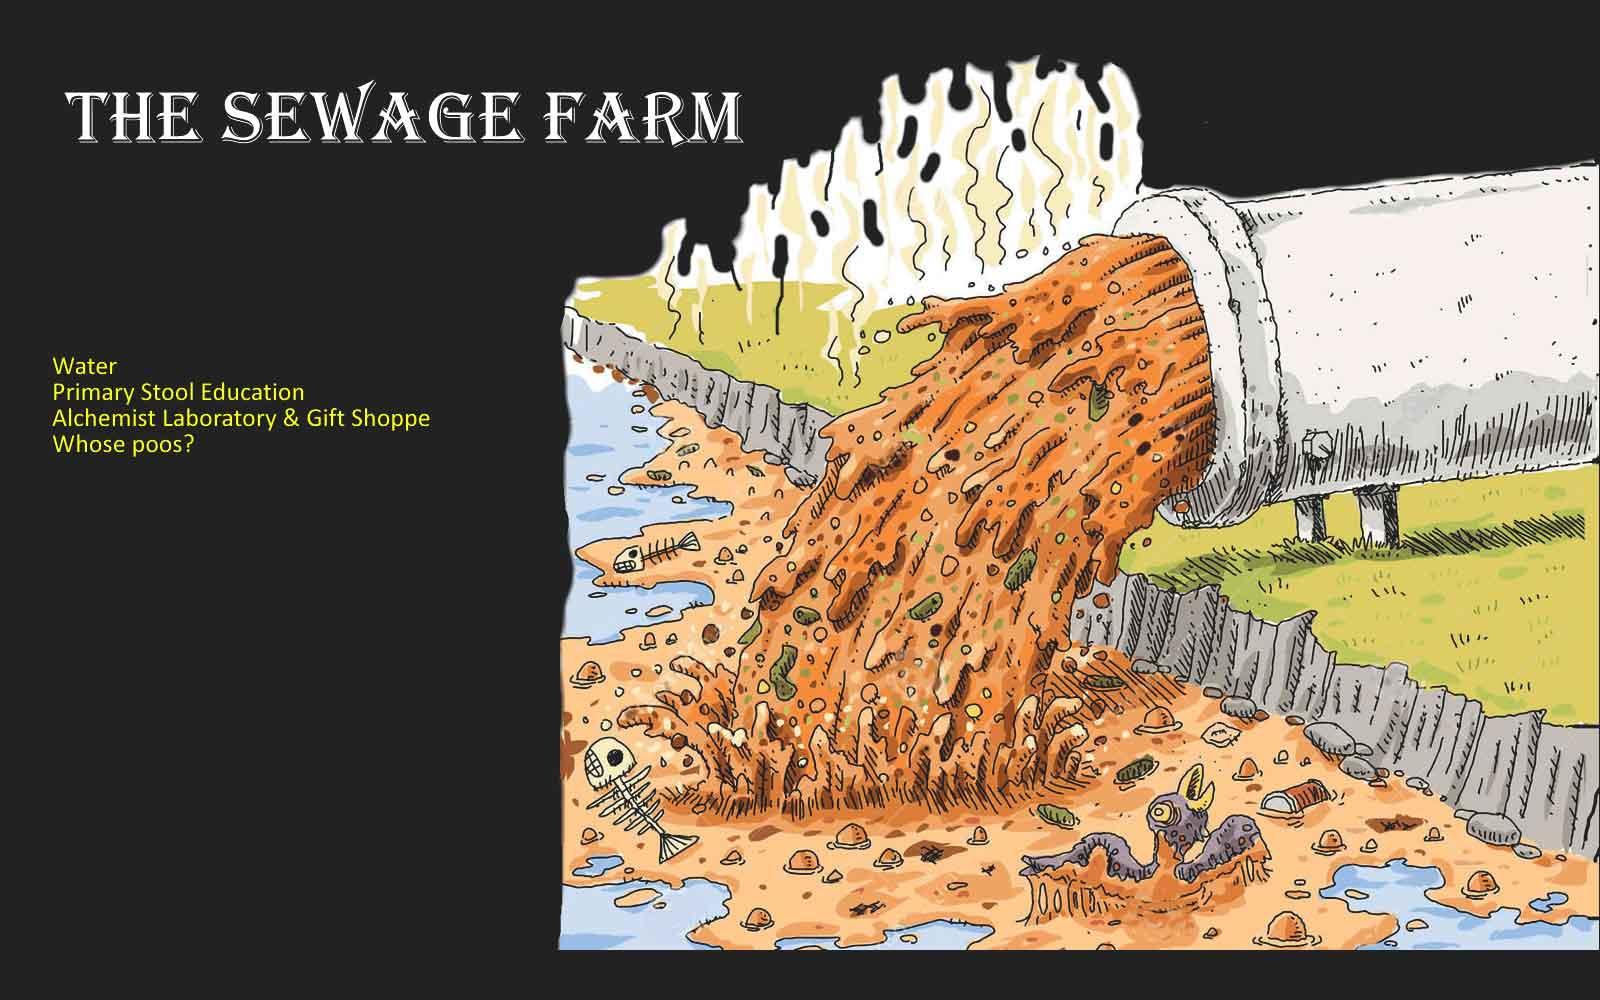 The Sewage Farm